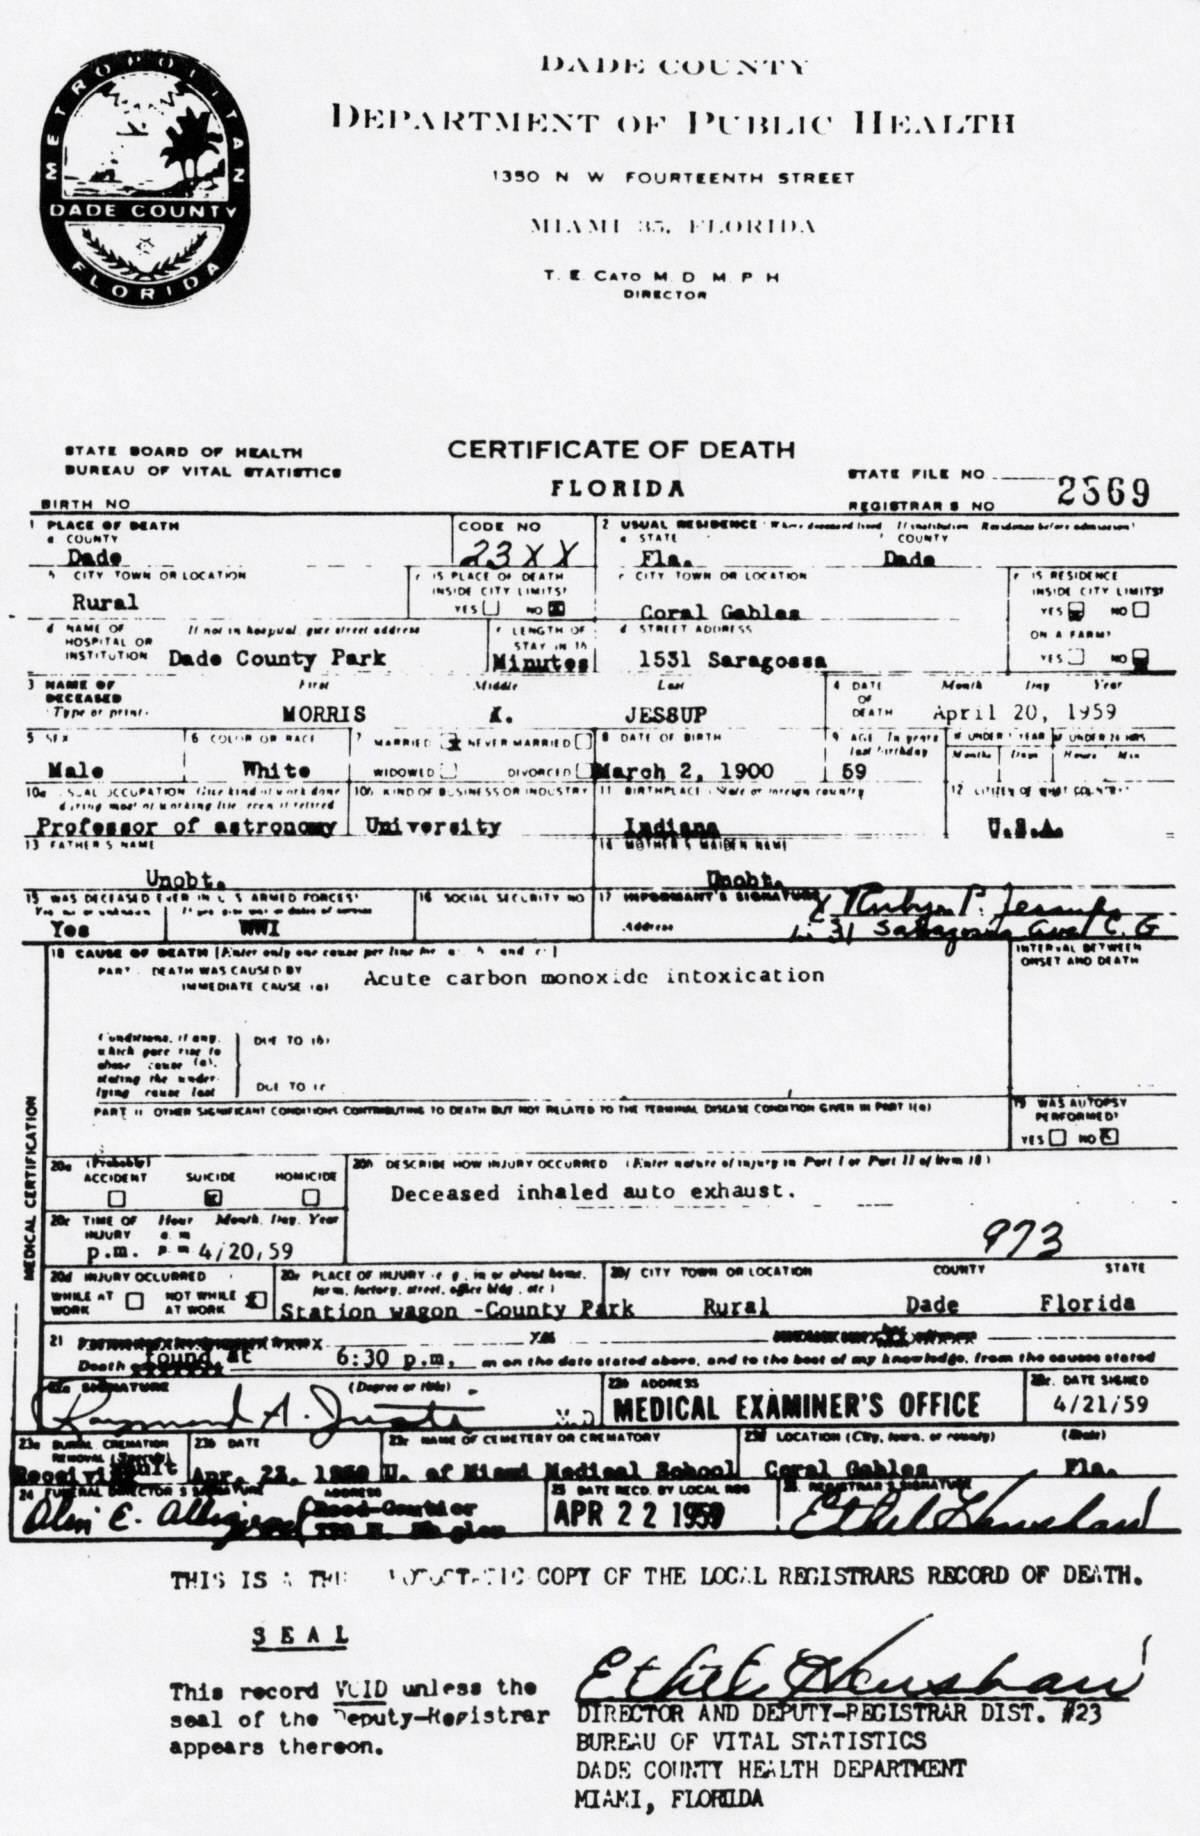 Morris K. Jessup's Death Certificate